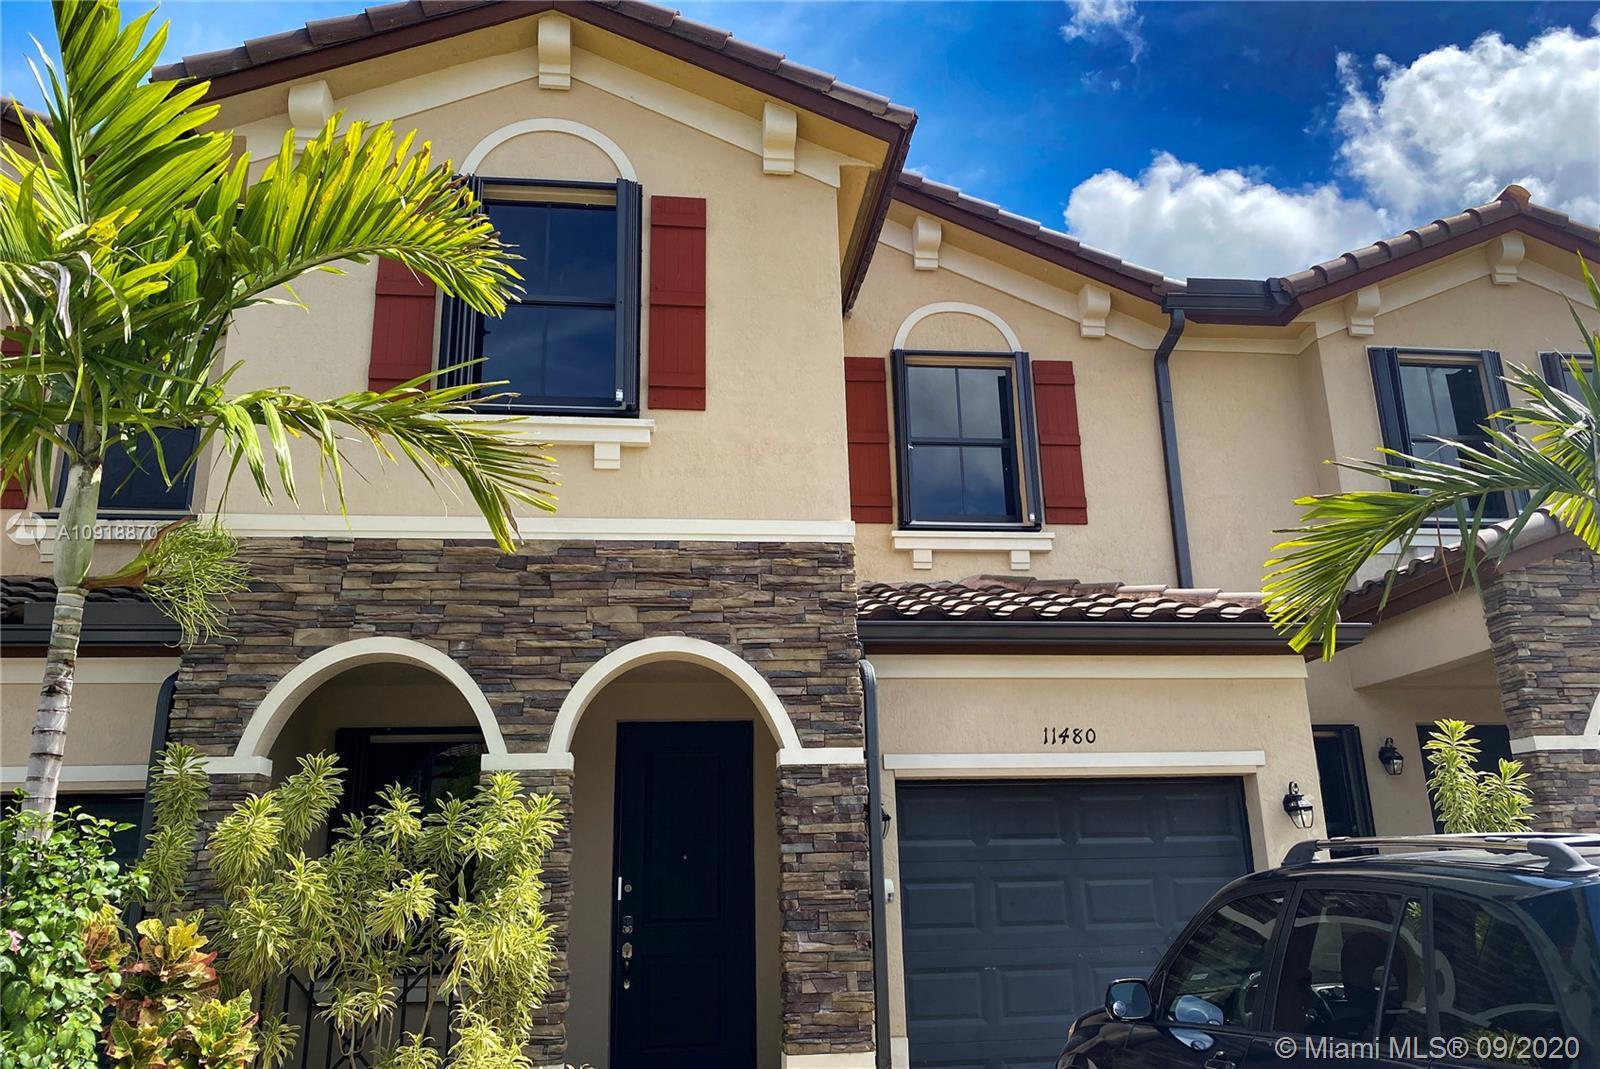 11480 SW 254th St #11480 Property Photo